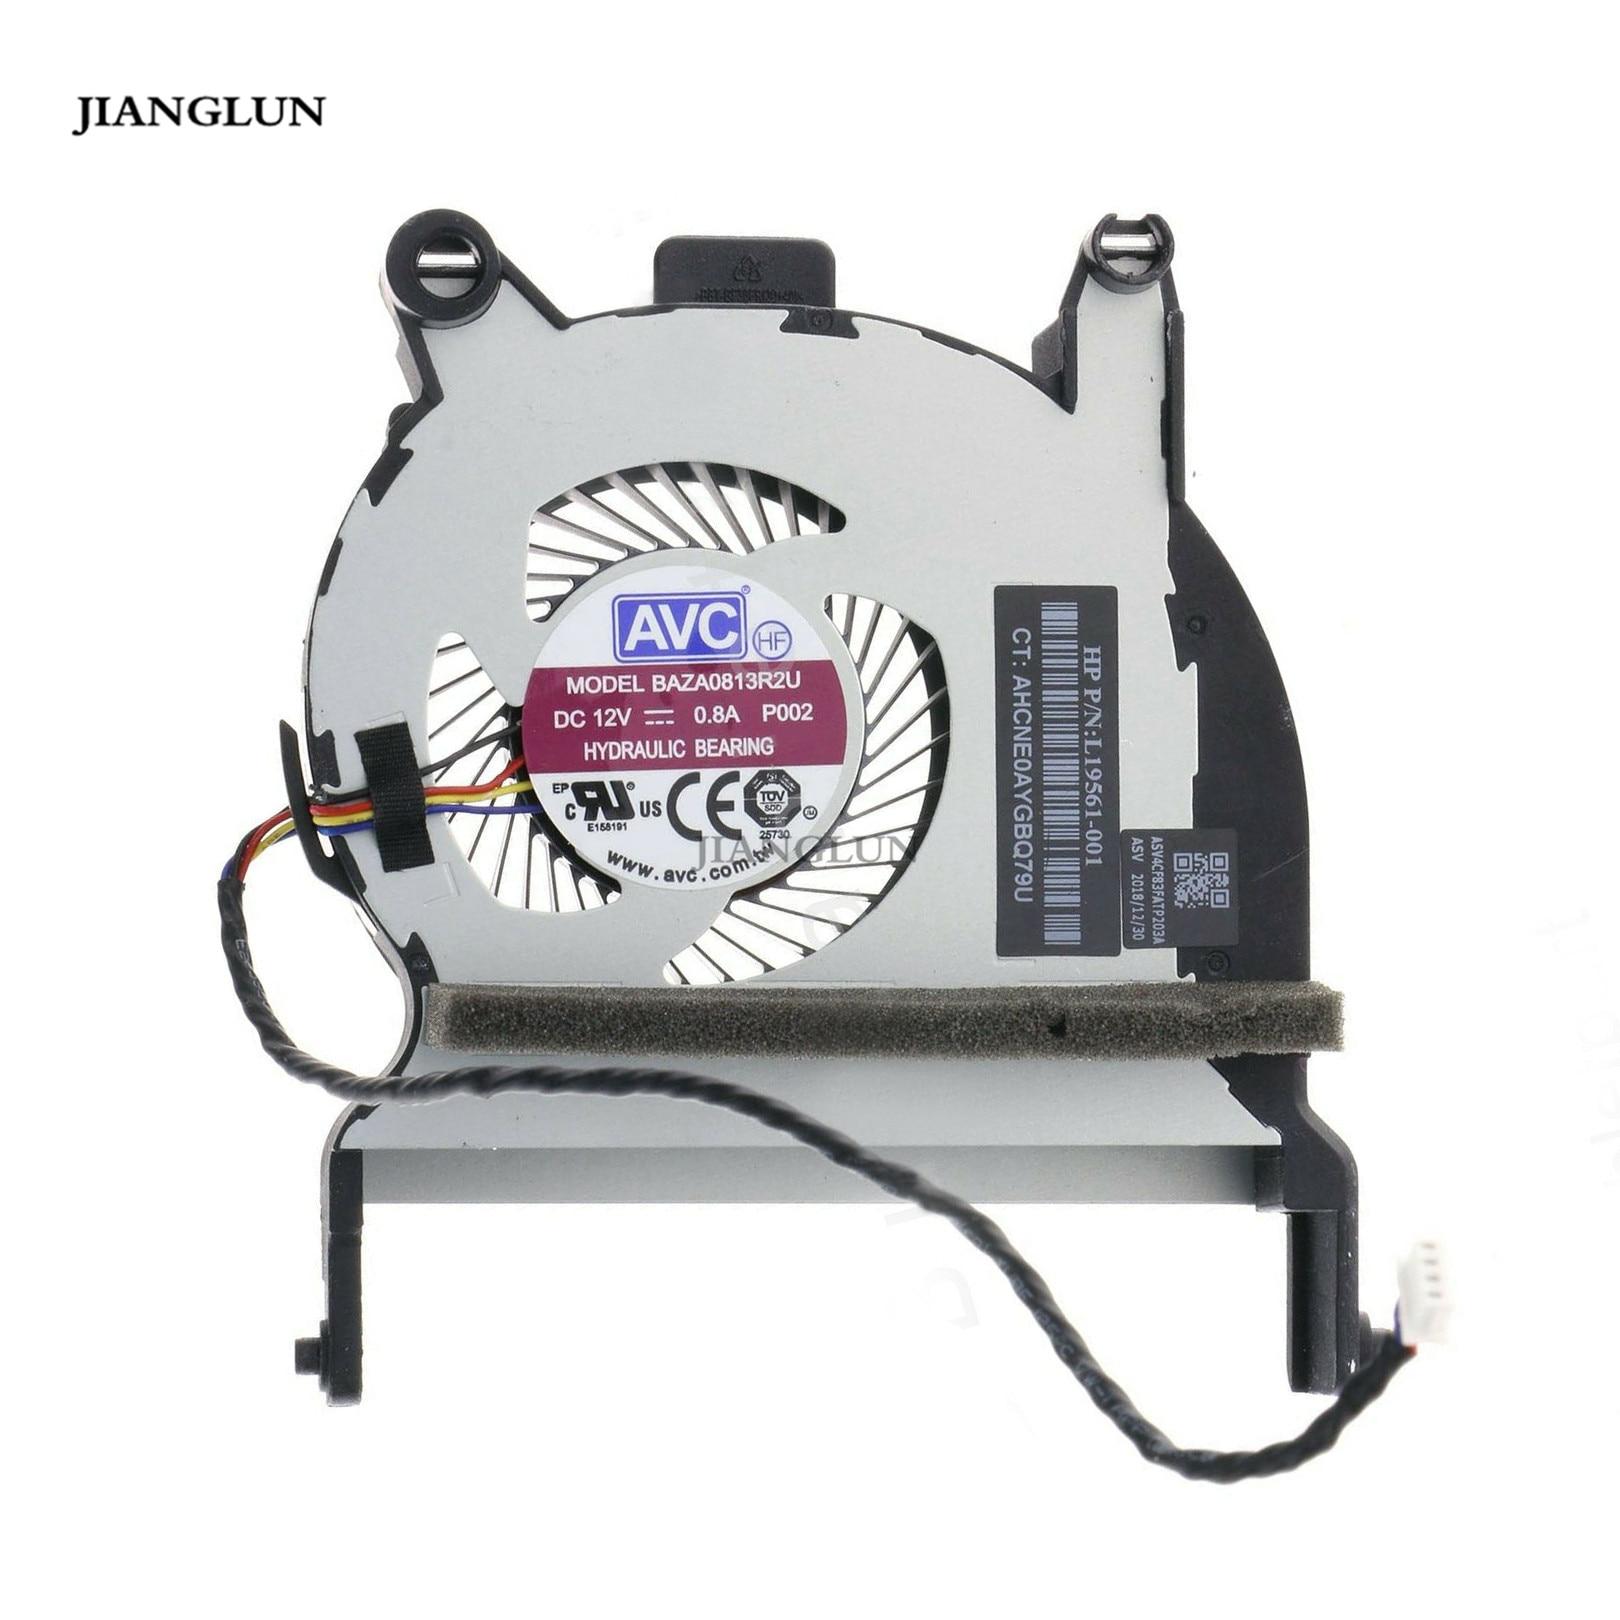 JIANGLUN Laptop For HP EliteDesk 800 G4 35W Desktop Mini PC CPU Cooling Fan L19561-001